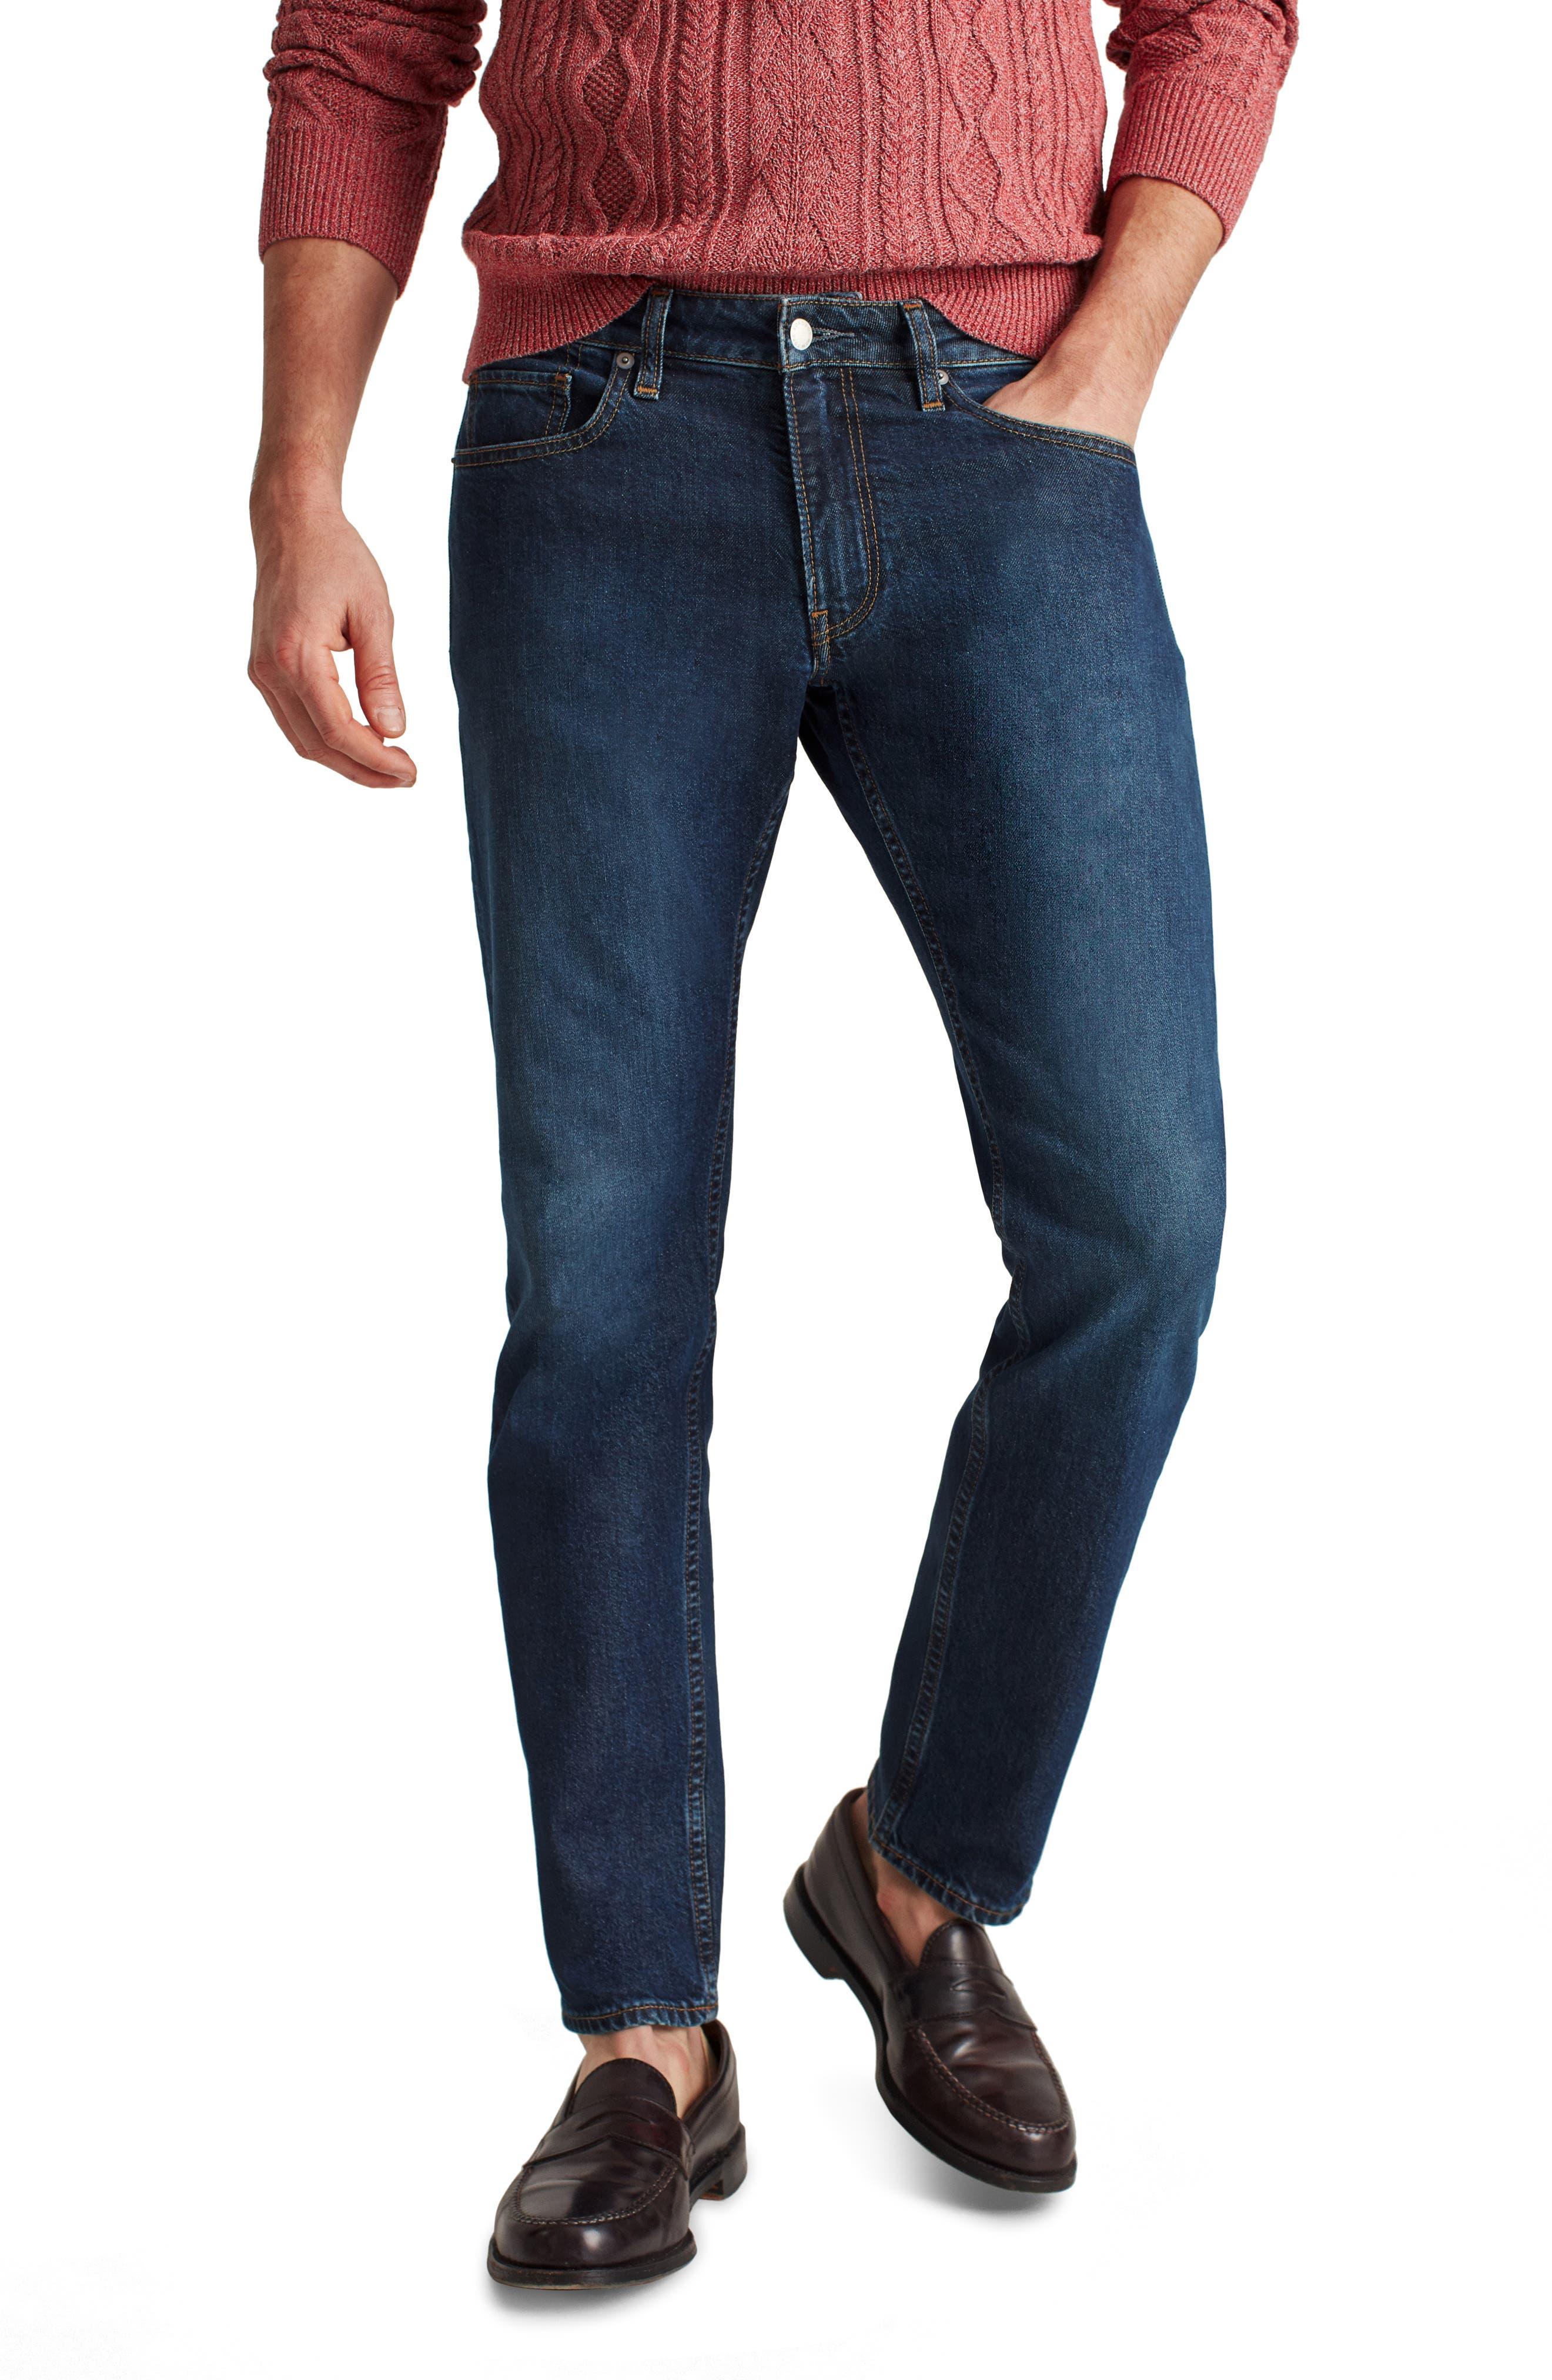 All Season Travel Slim Fit Stretch Jeans